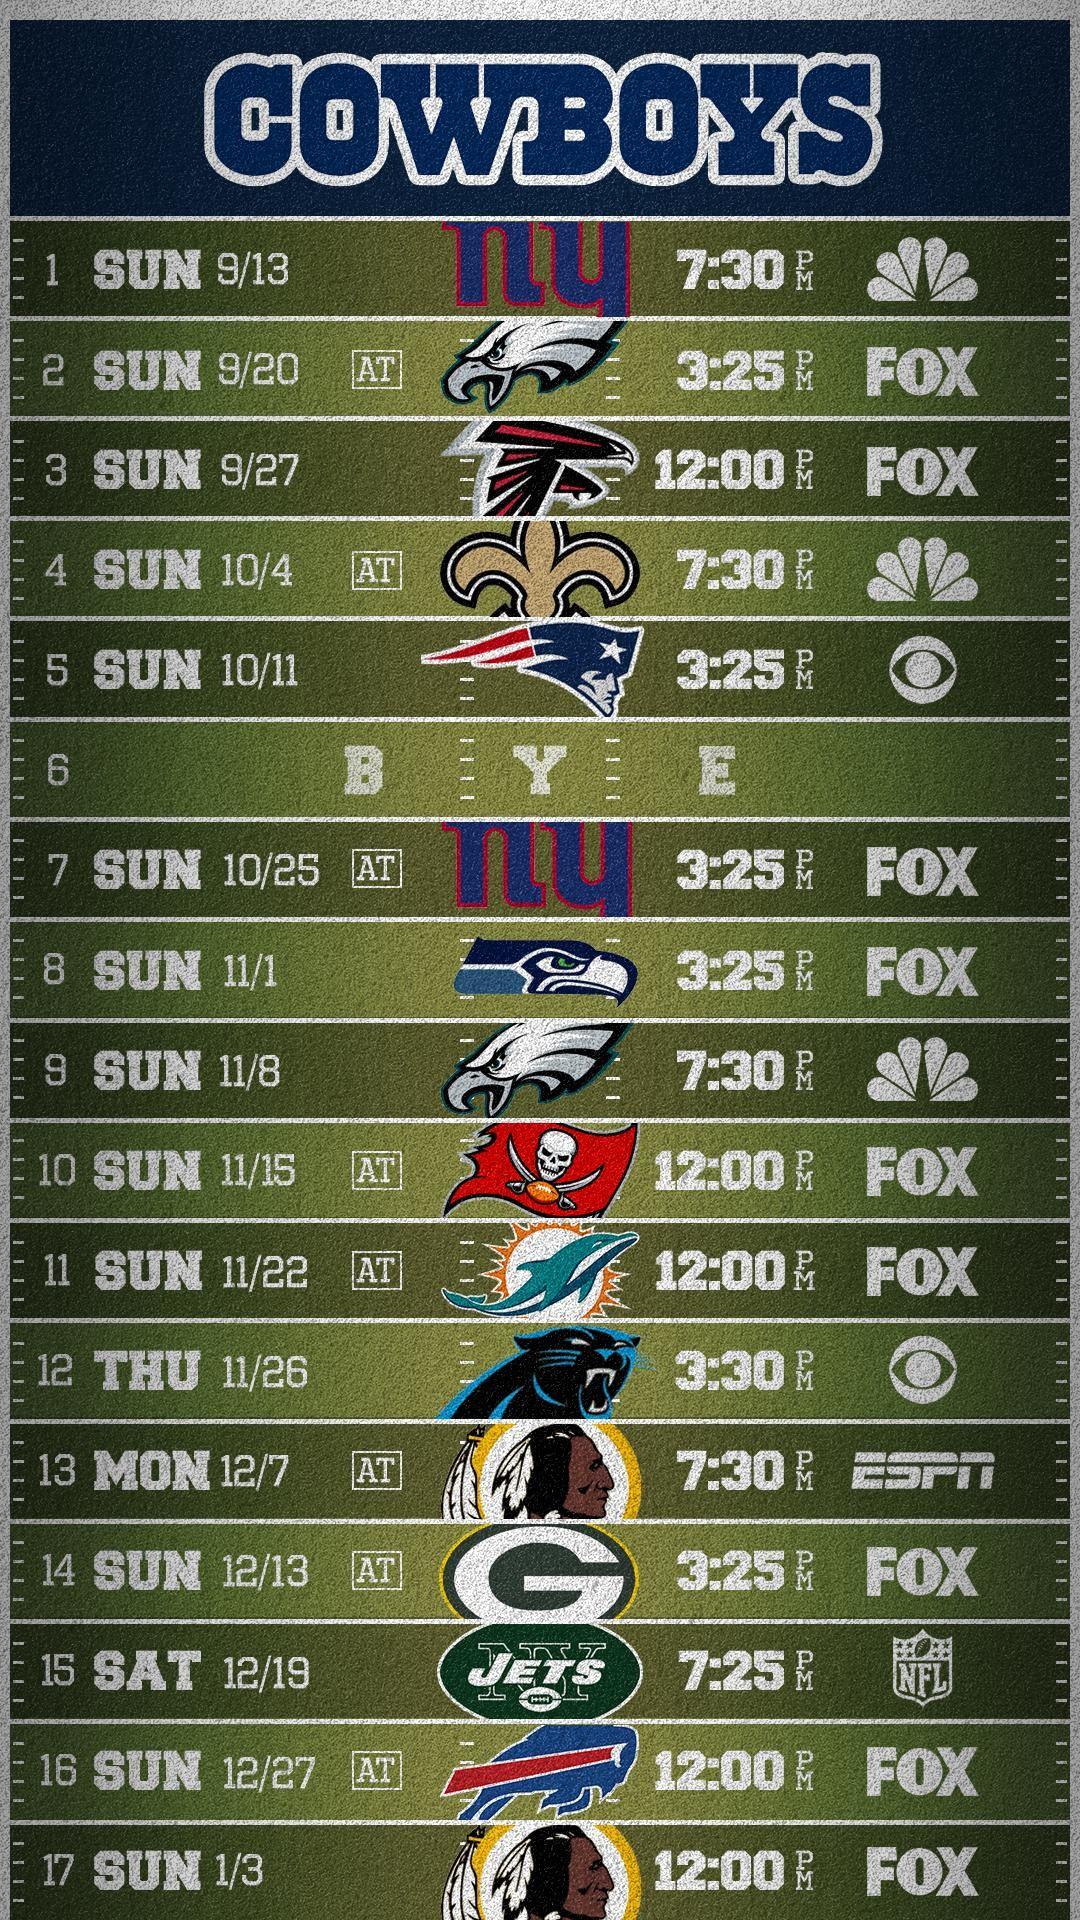 Cowboys Field Schedule Wallpaper   Data-src /w/full/d/5/a/218745 - Dallas Cowboys - HD Wallpaper